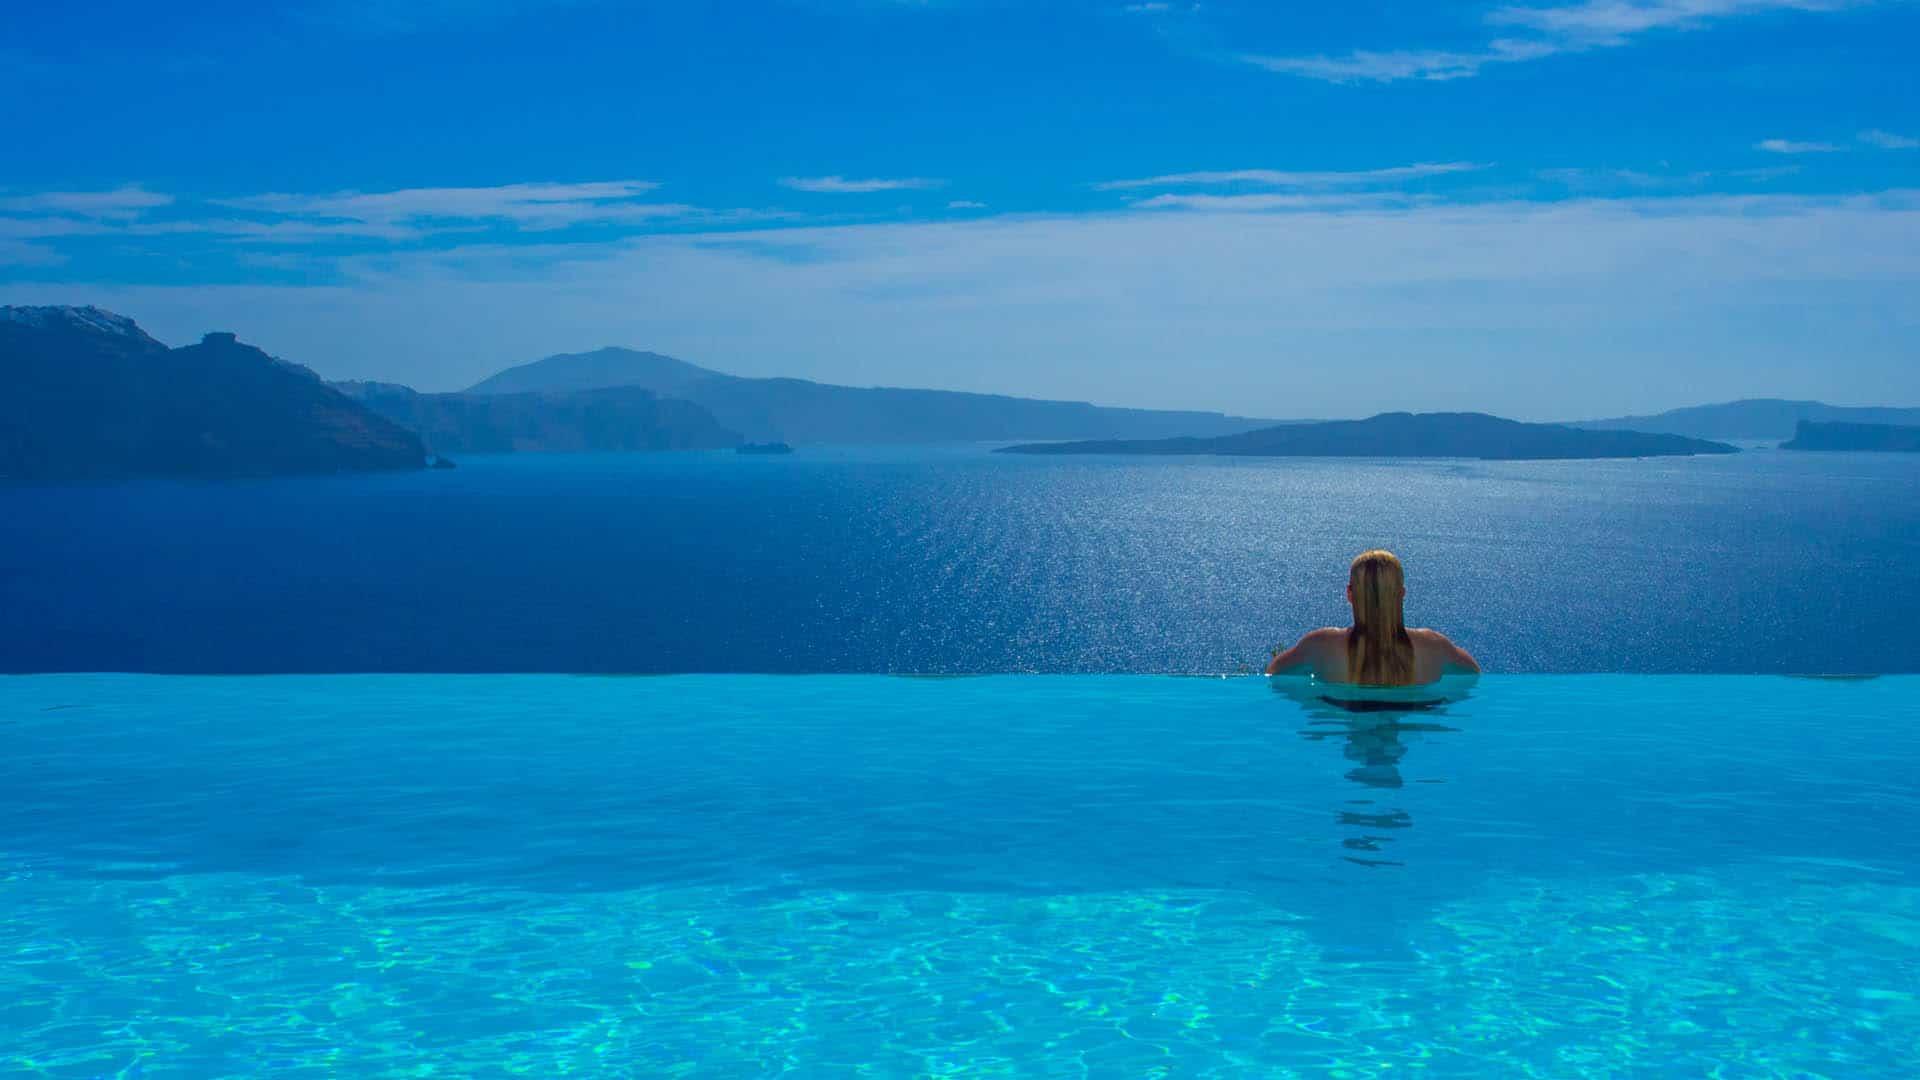 luxury travel blogs | infinity pool in santorini greece